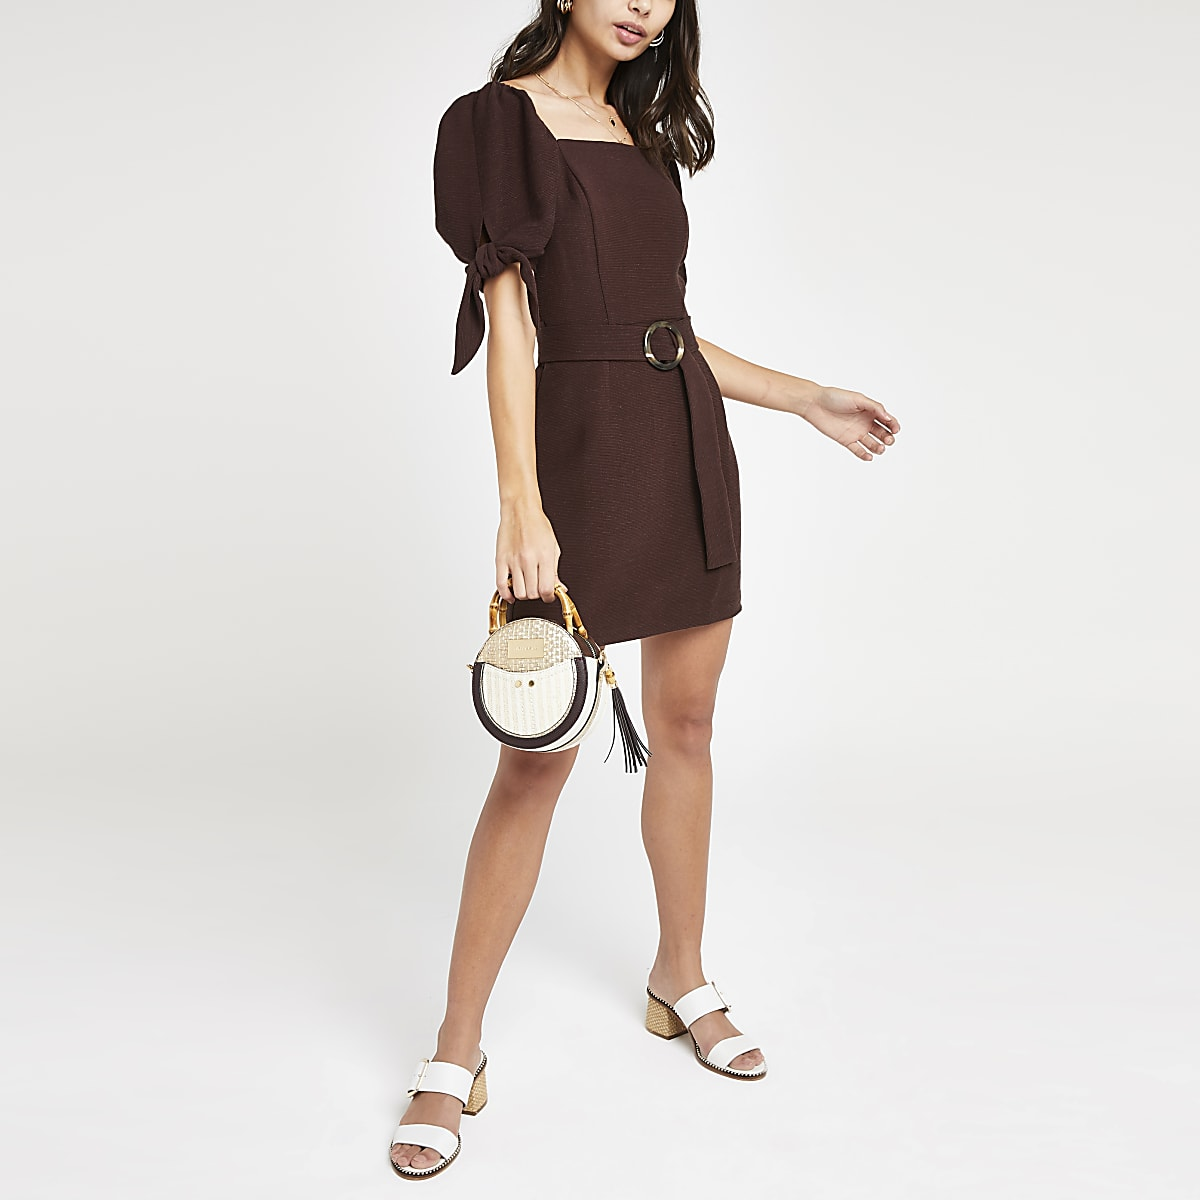 Mini robe marron foncé ceinturée